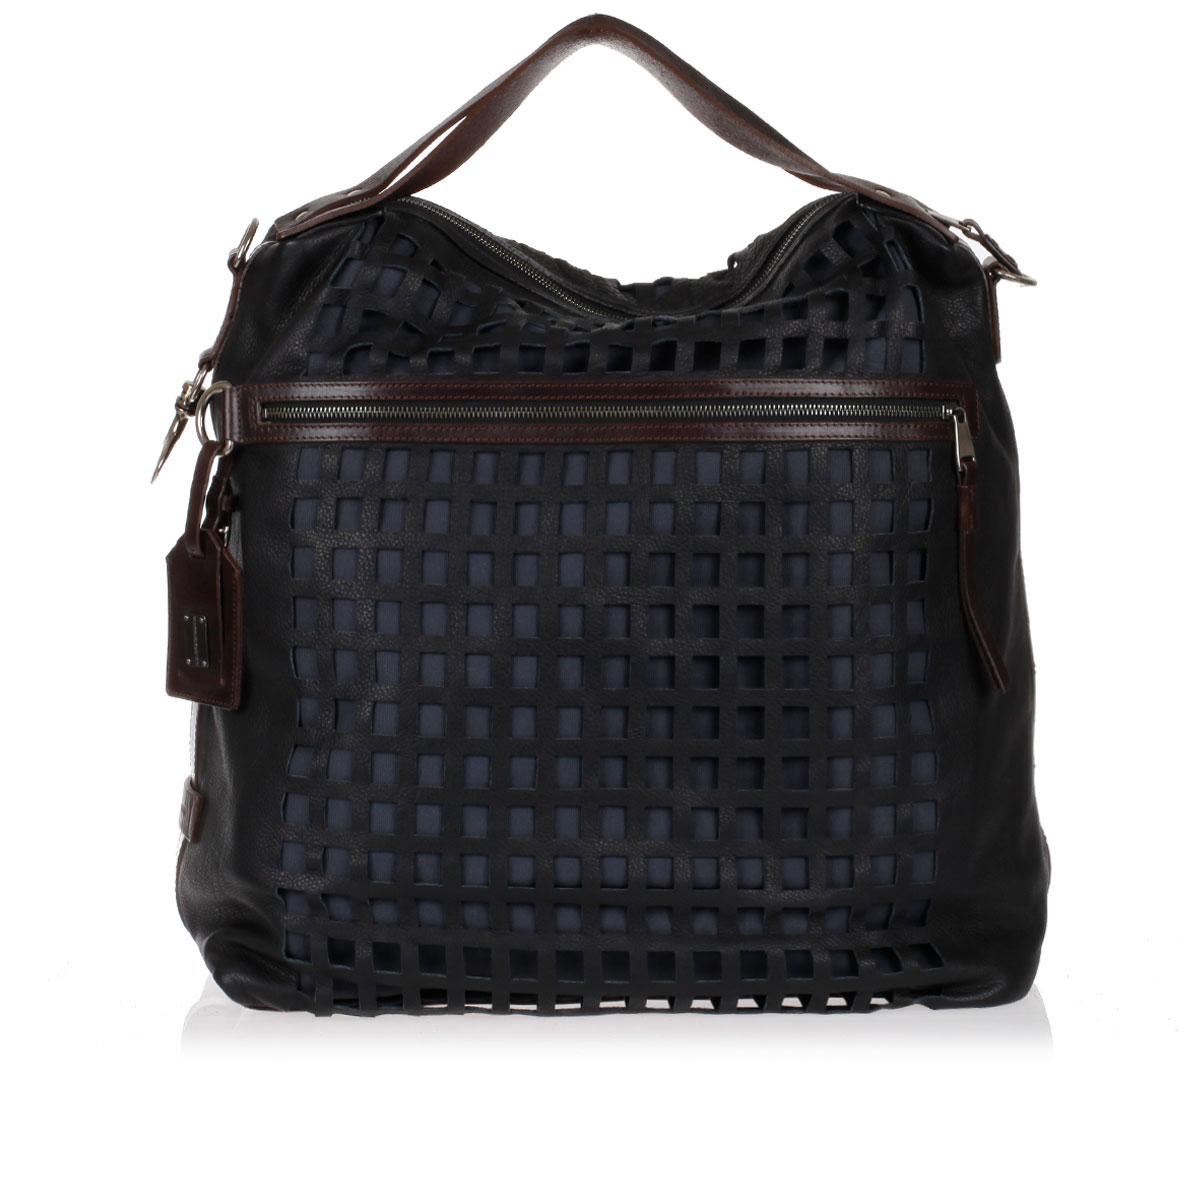 762bdd7d68 Dolce   Gabbana · Messenger Shoulder-Bag made with Canvas and Leather